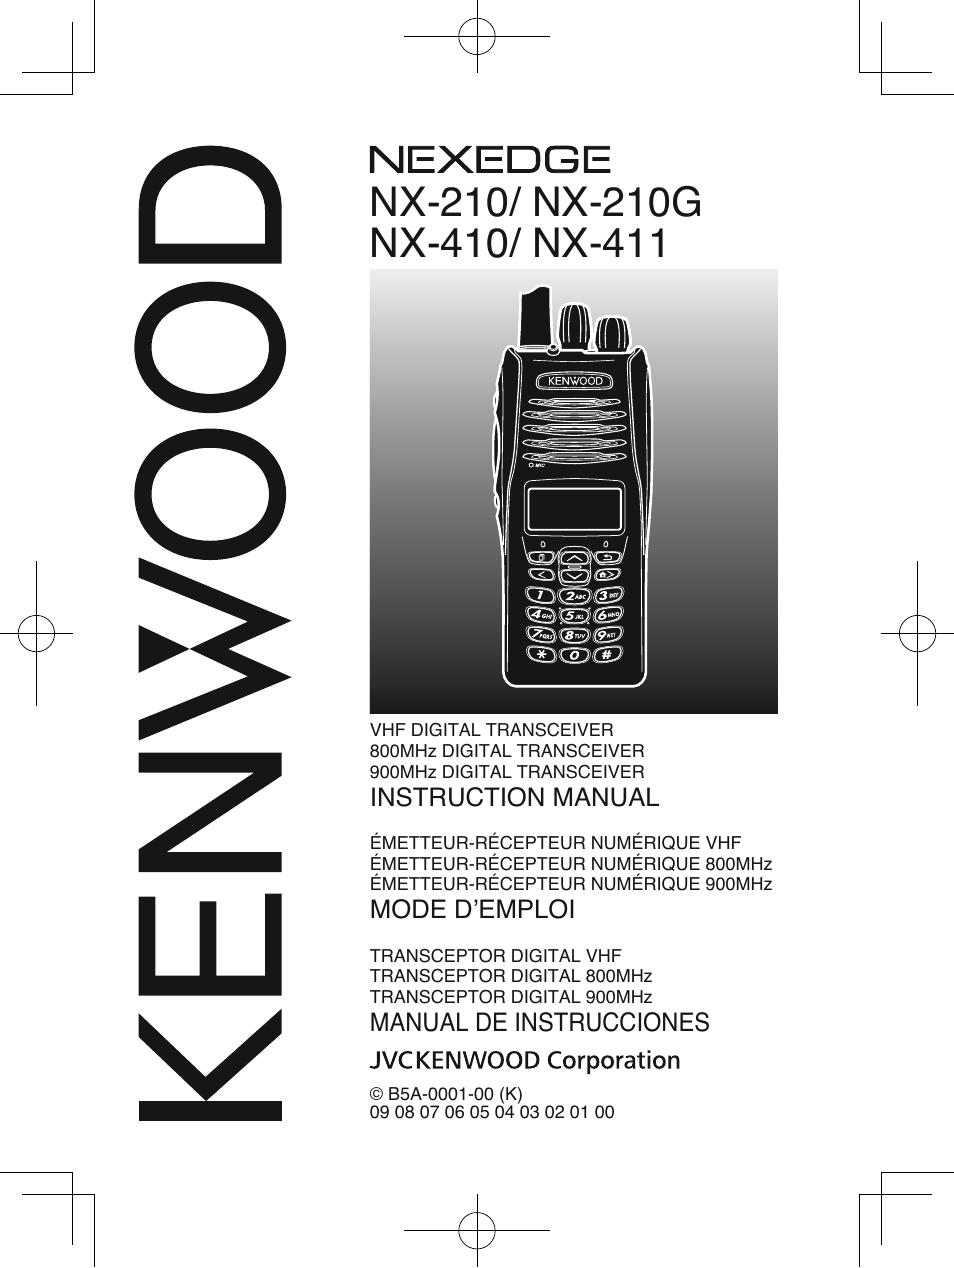 kenwood nx 210g user manual 48 pages rh manualsdir com Kenwood Radios Kenwood Portable Two-Way Radios